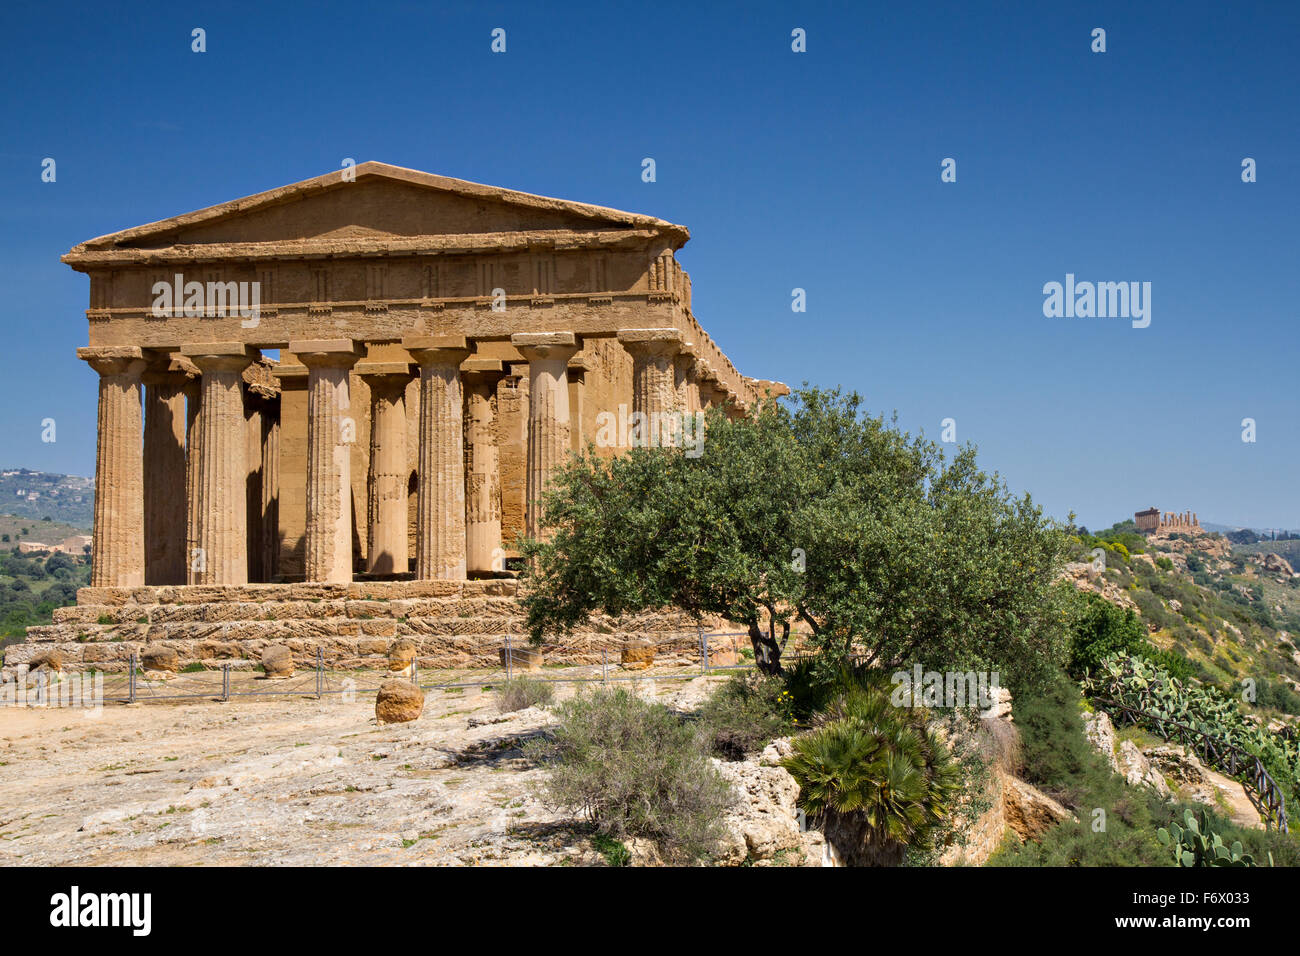 Vallée des Temples, Agrigente, Sicile, Italie Photo Stock